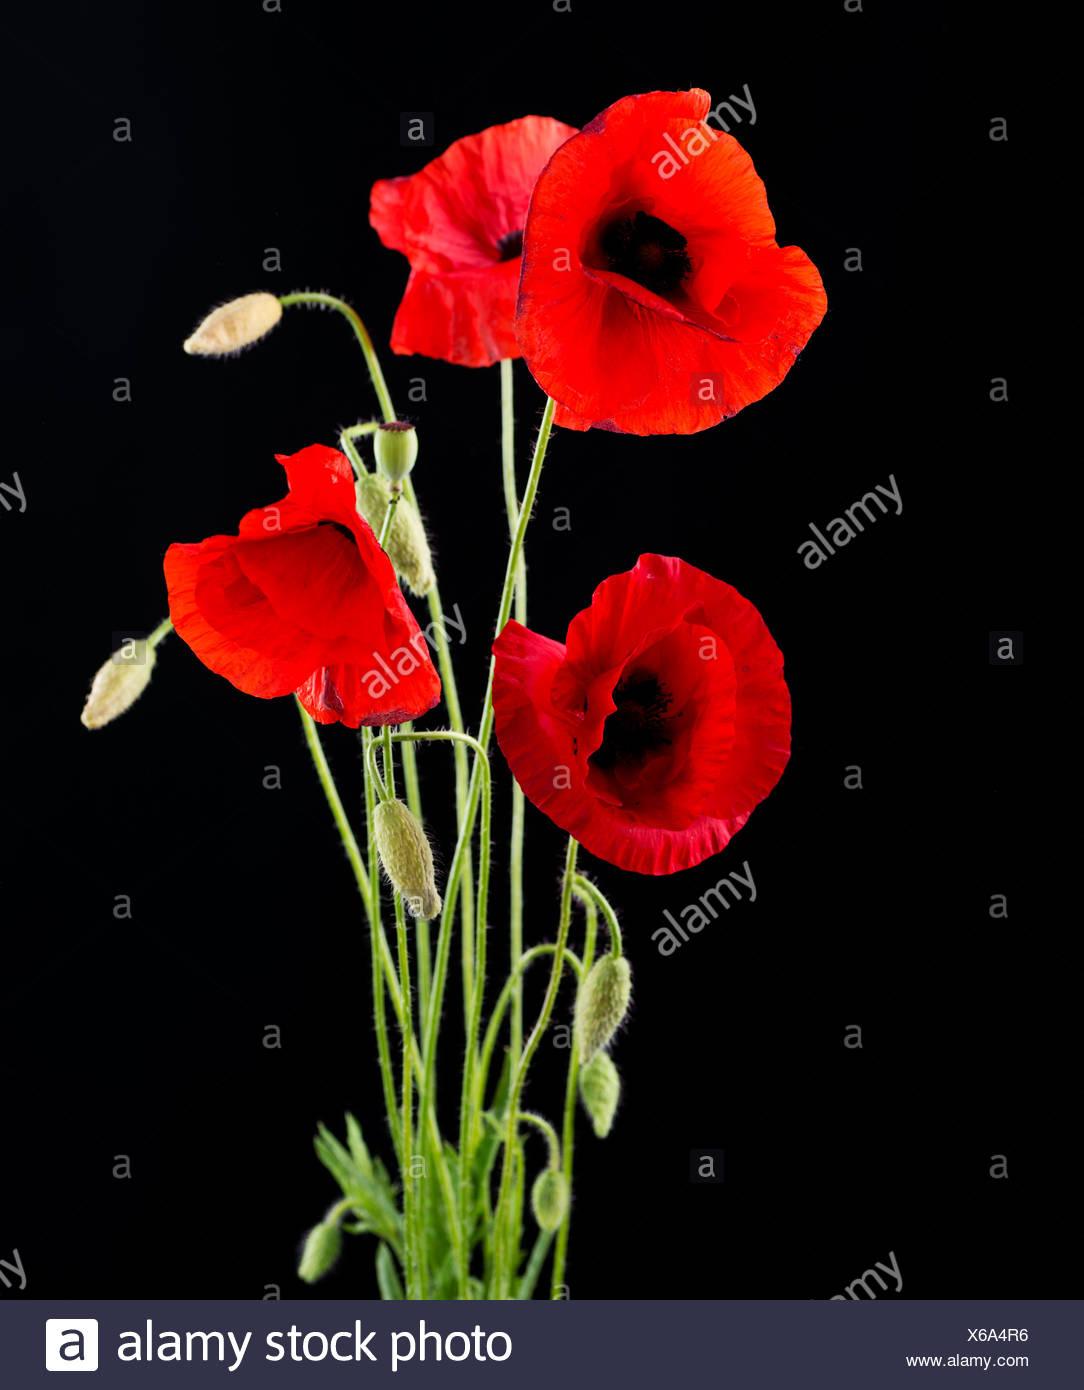 Red poppy flower isolated on black stock photo 279277130 alamy red poppy flower isolated on black mightylinksfo